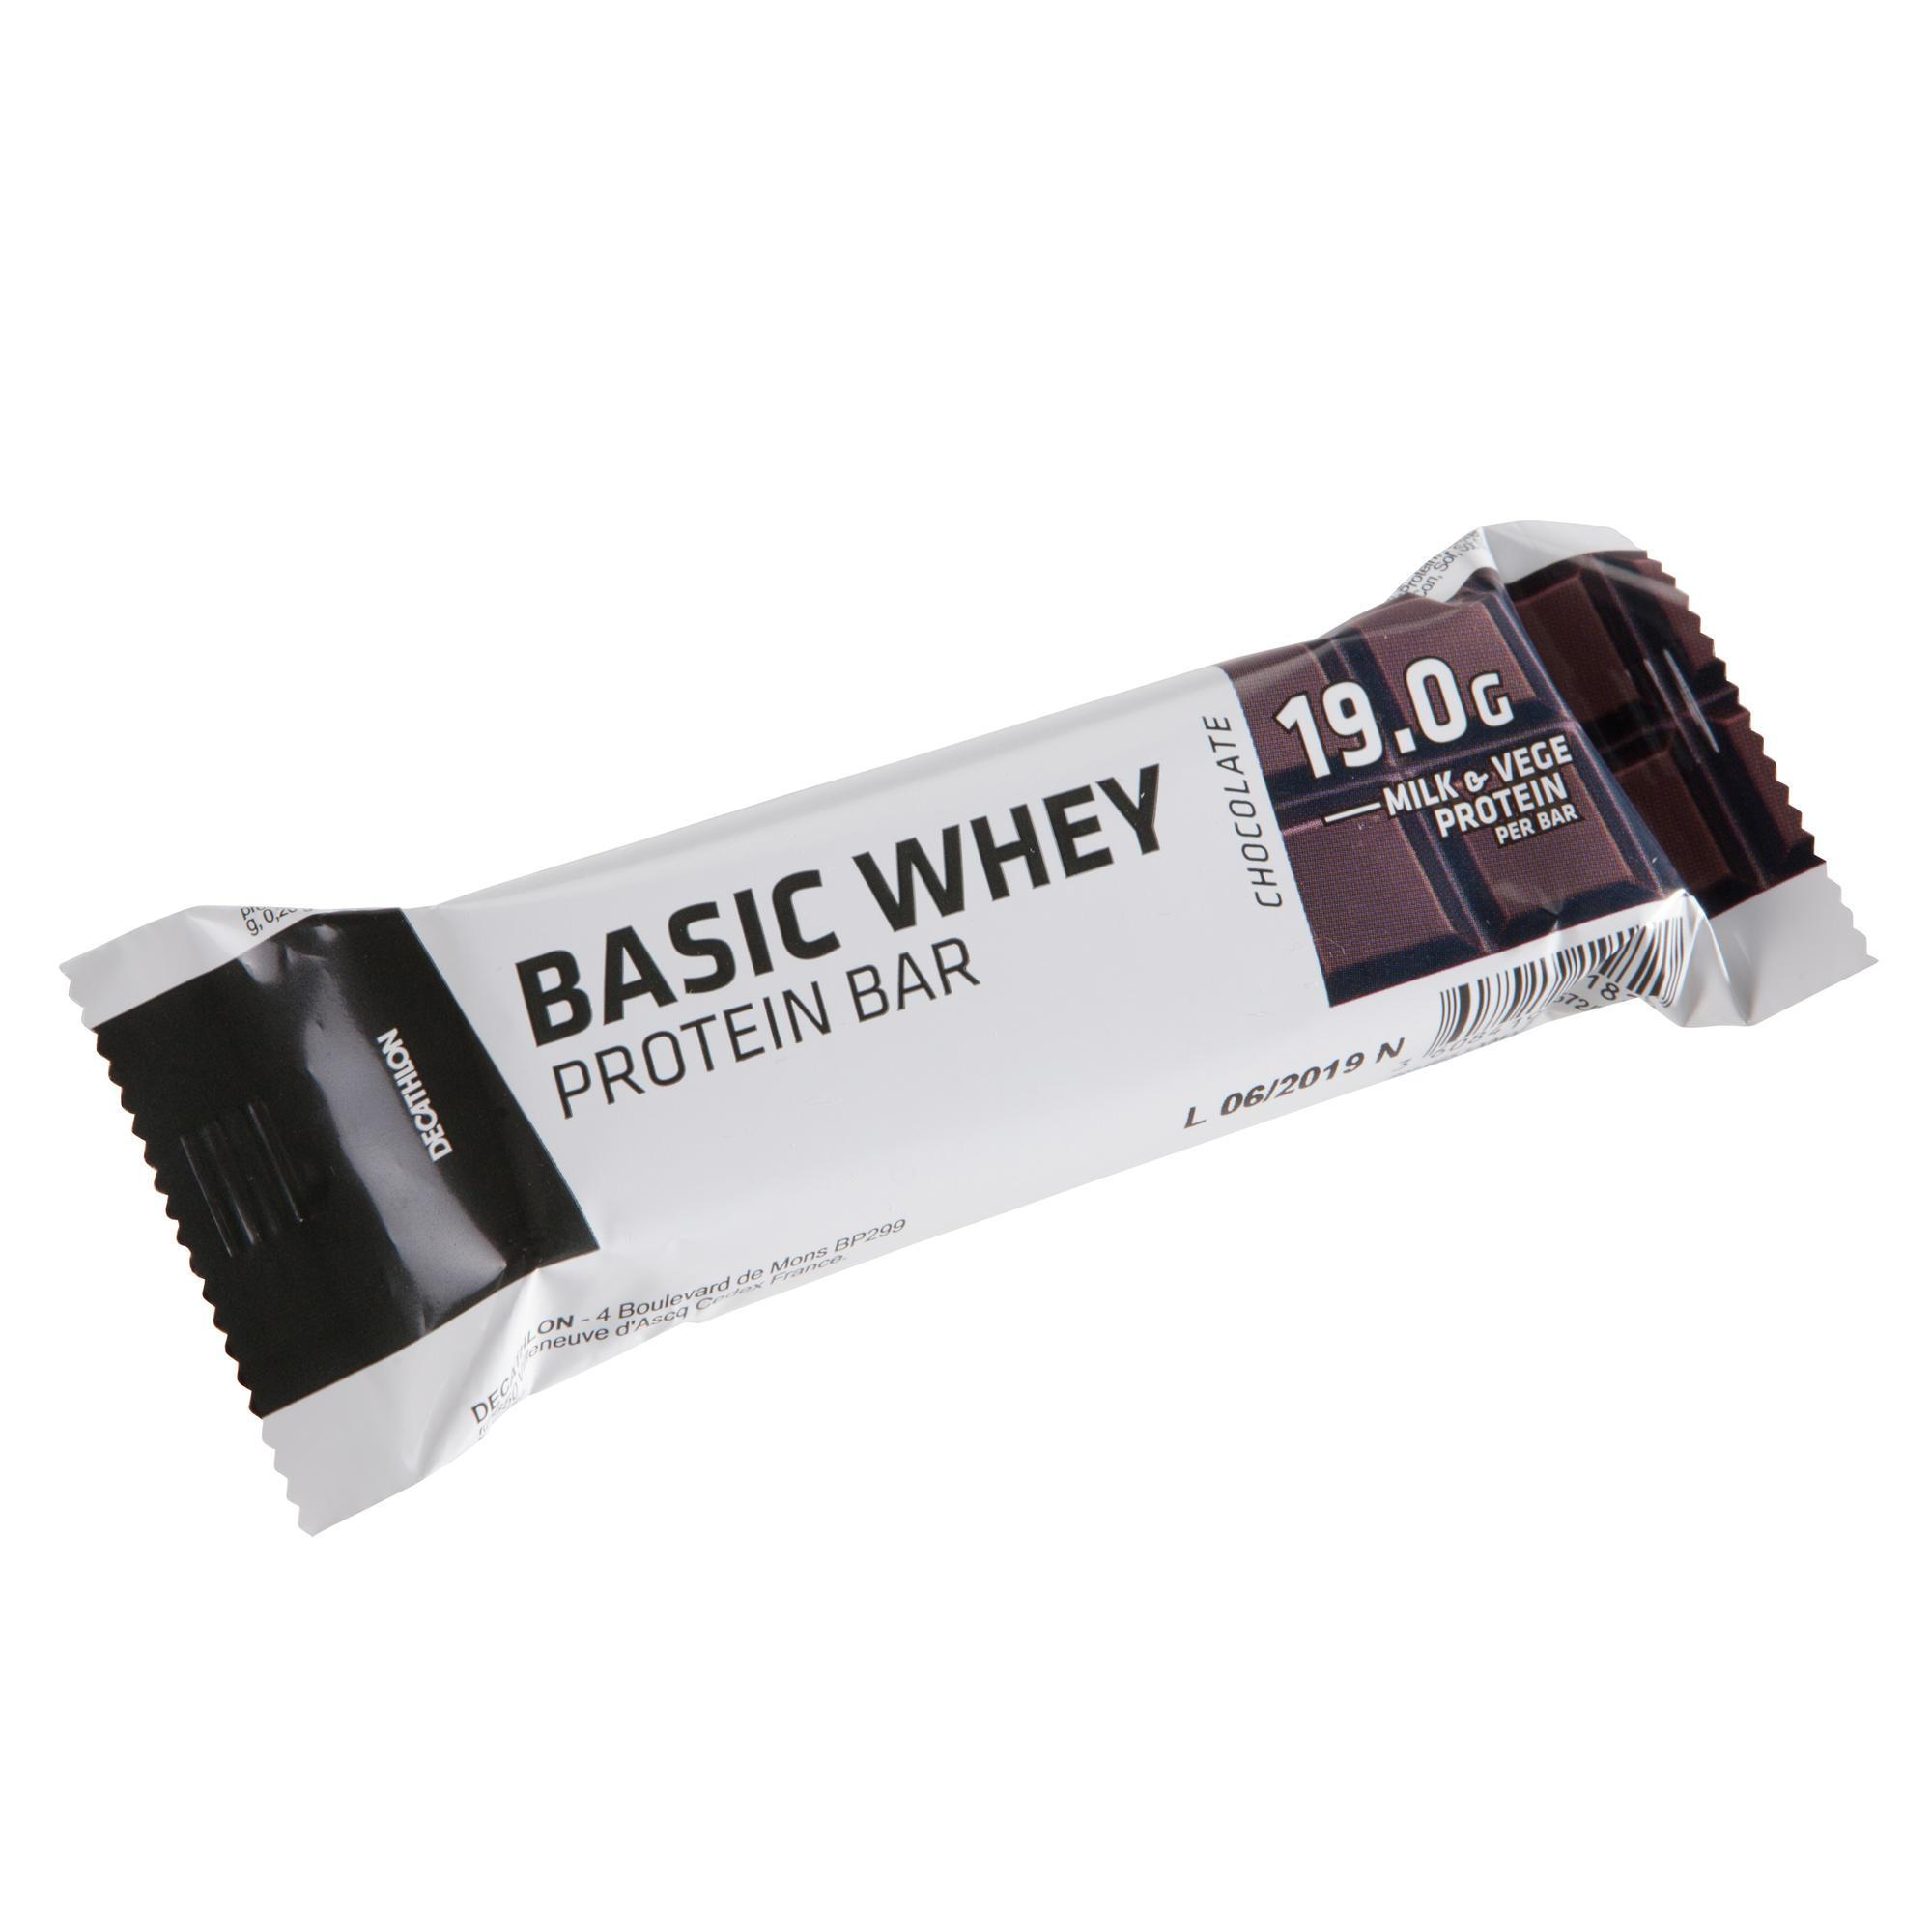 Proteinriegel Basic Whey Schokolade